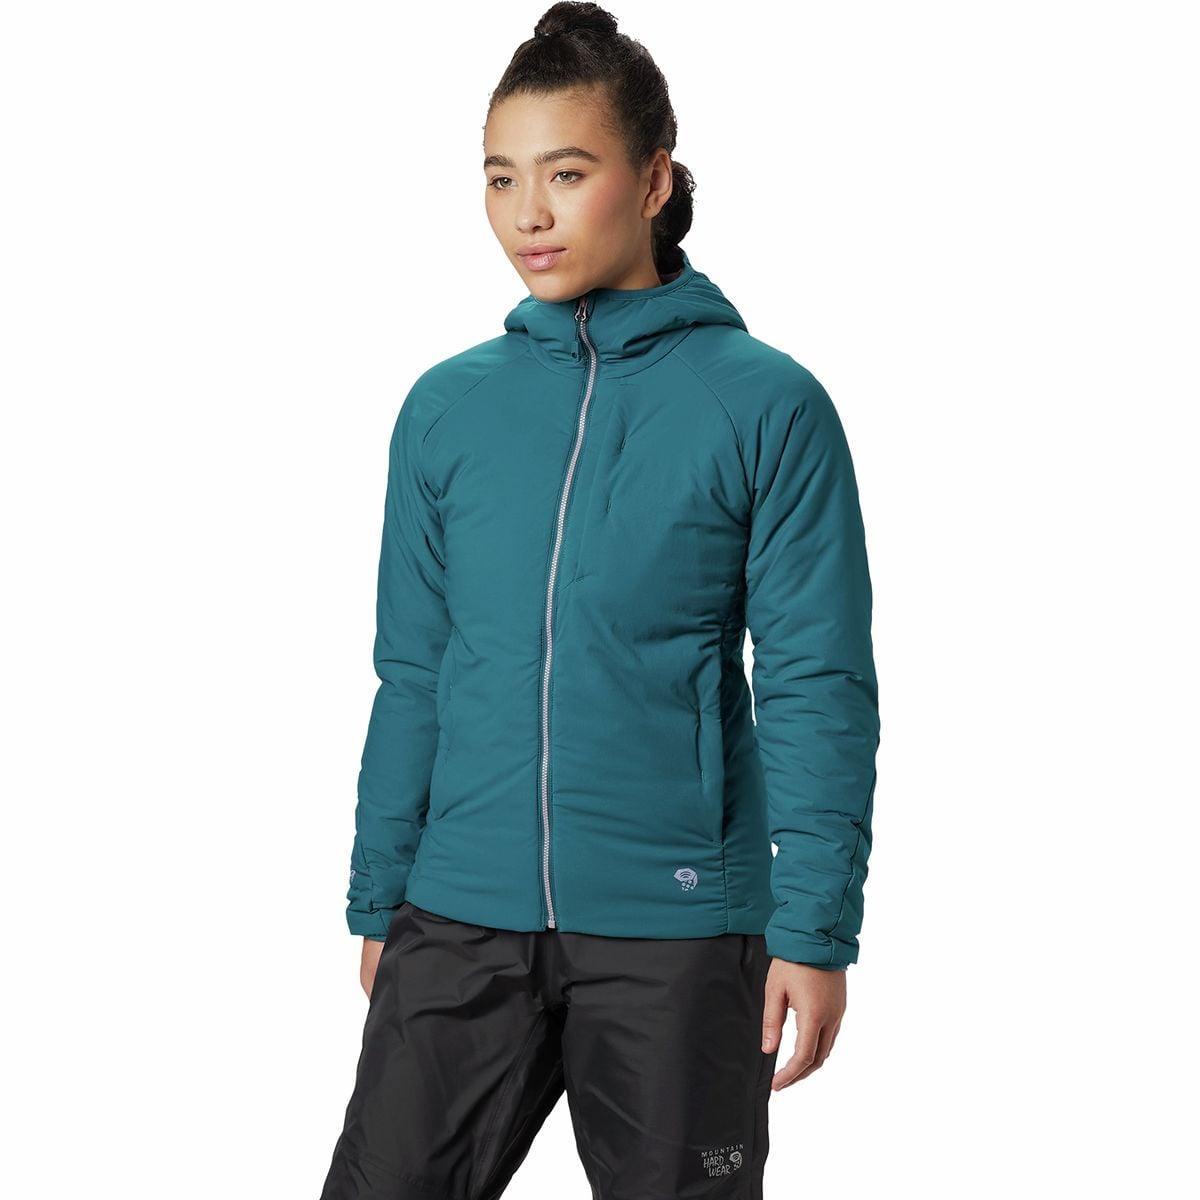 Kor Strata Hooded Jacket - Women